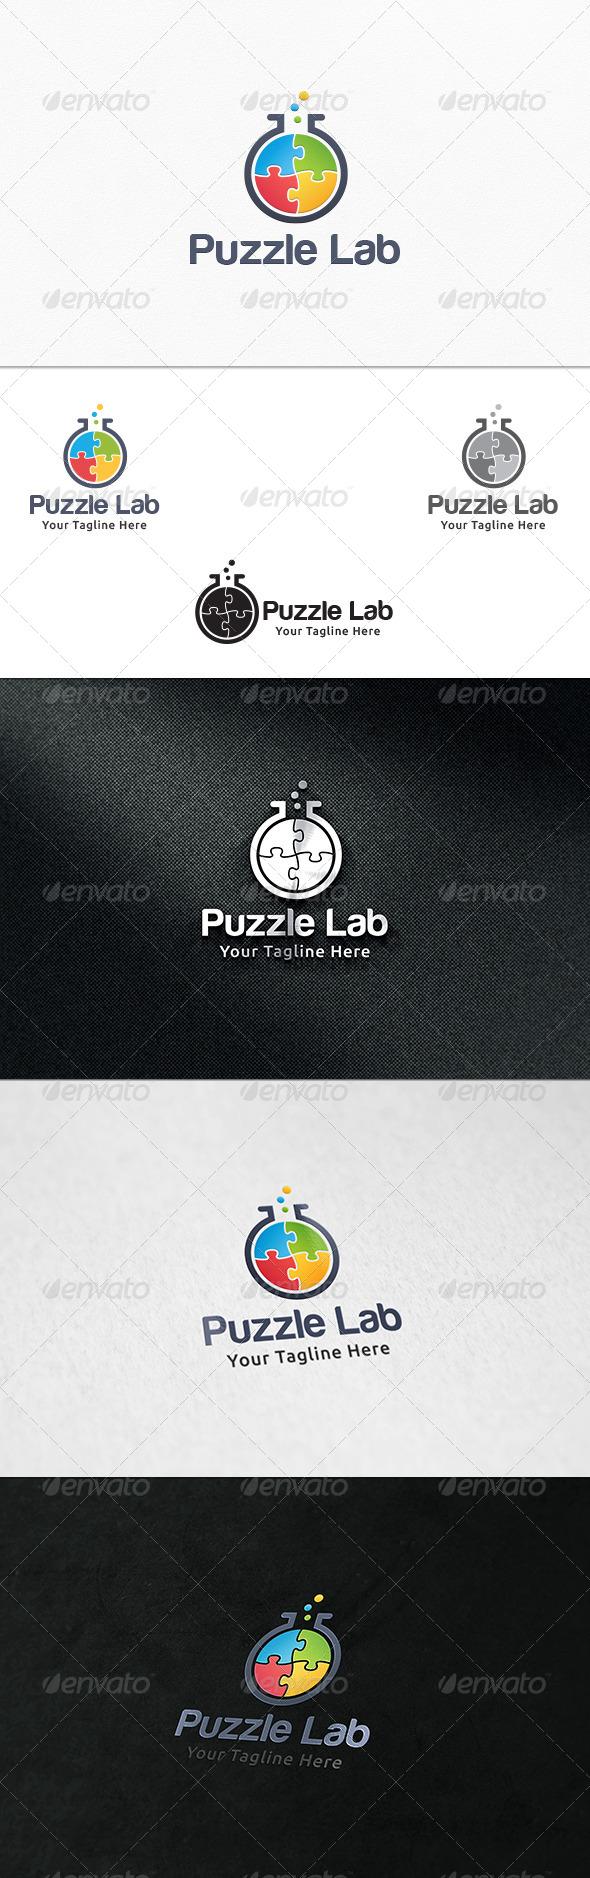 GraphicRiver Puzzle Lab Logo Template 7654025